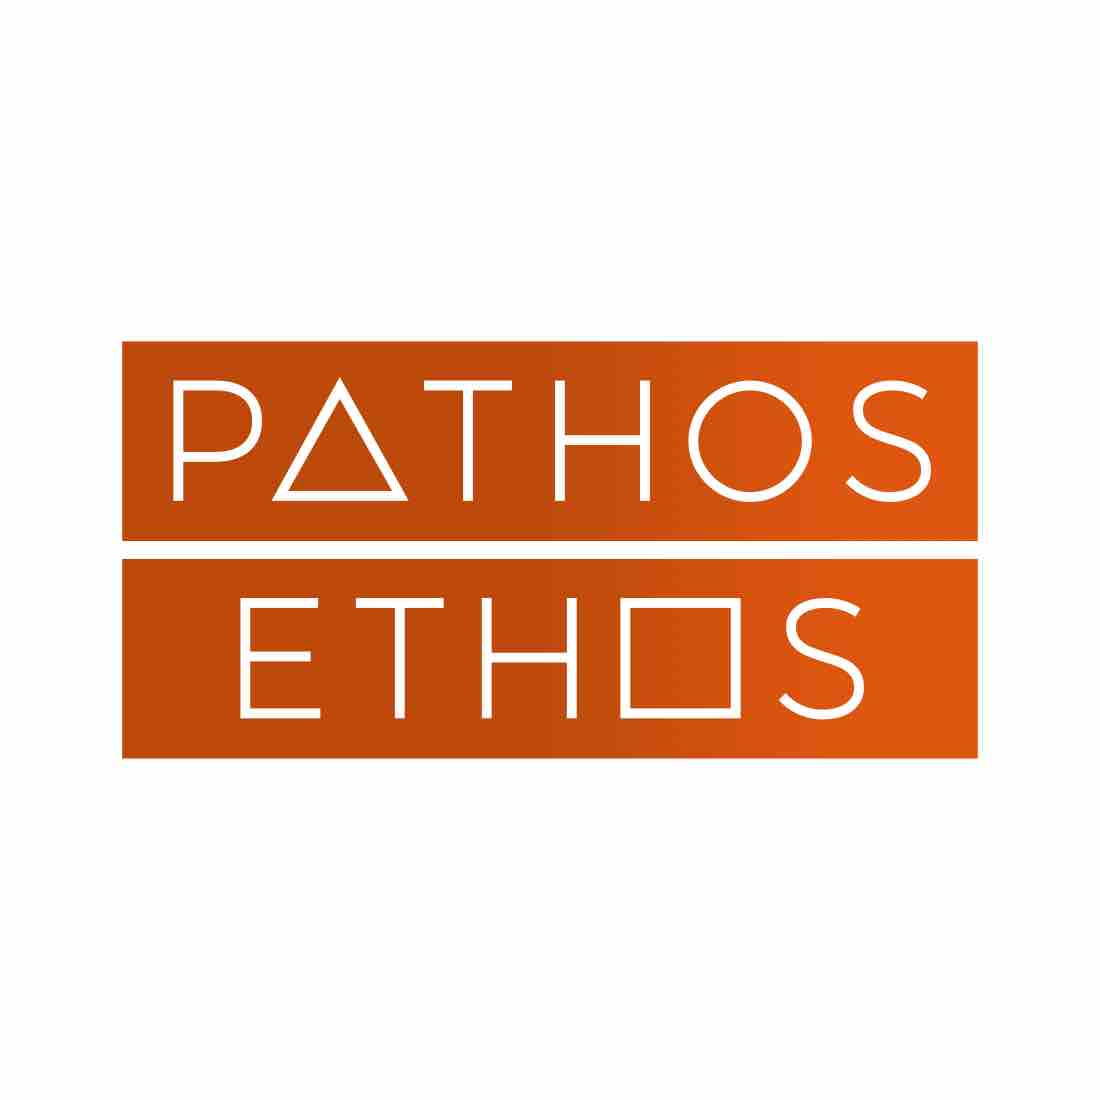 Pathos Ethos Logo